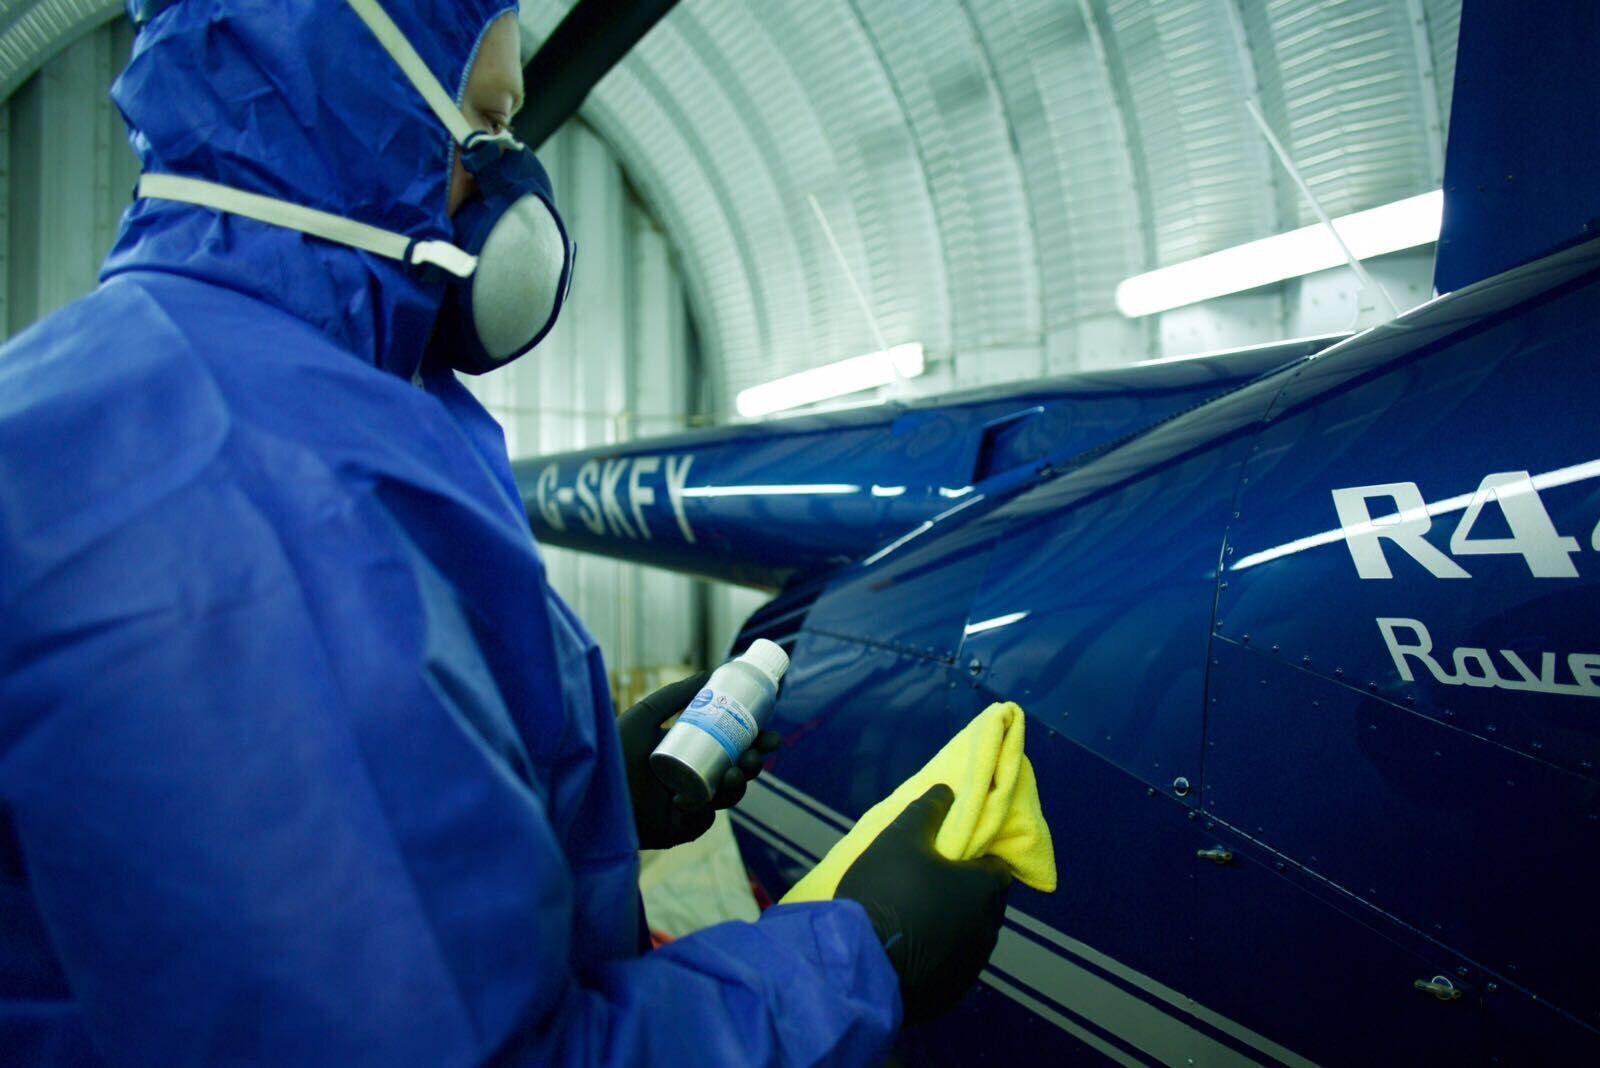 applying-ceramic-coating-on-jet